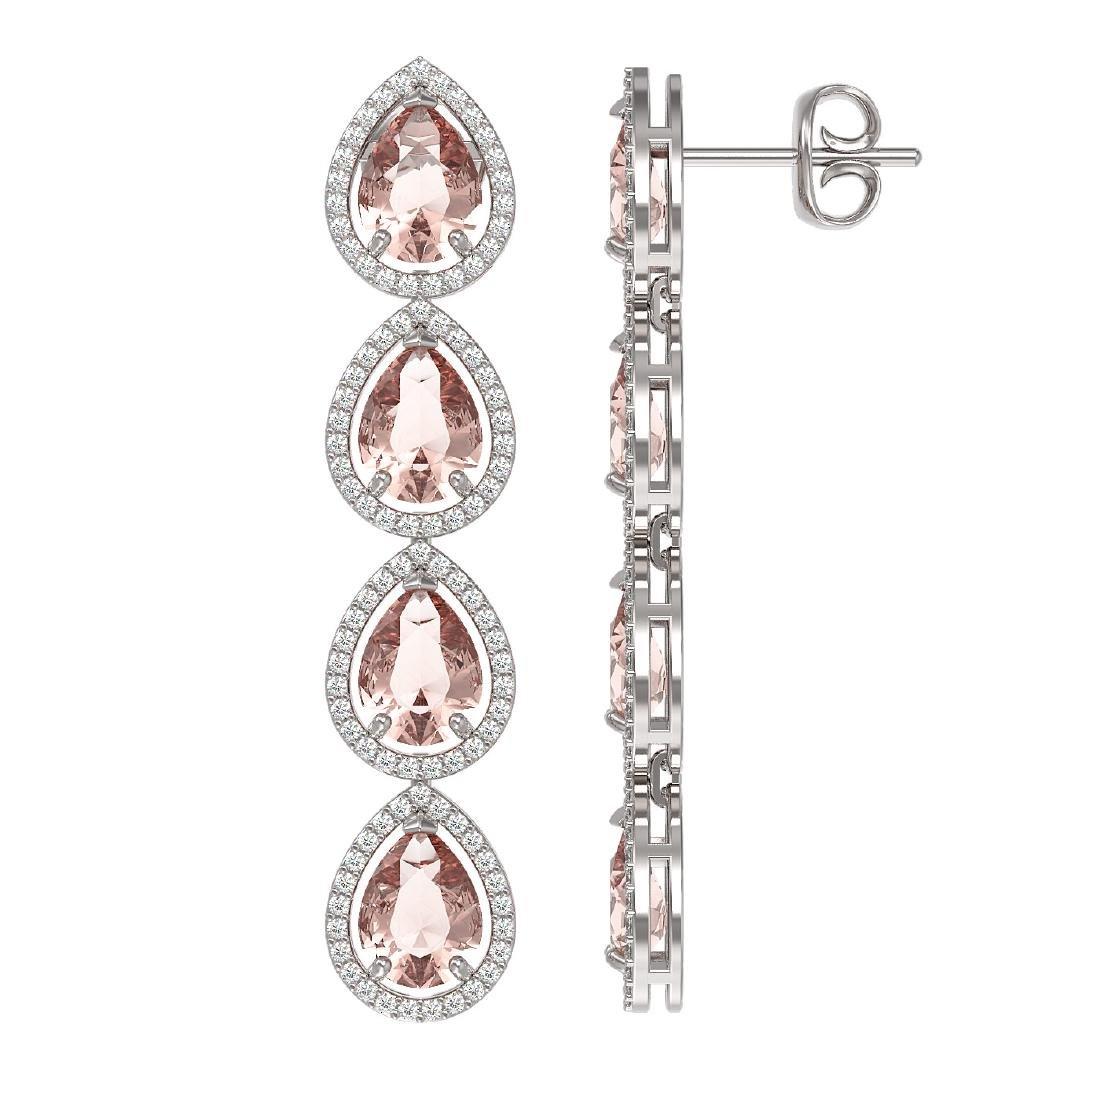 10.4 CTW Morganite & Diamond Halo Earrings 10K White - 2